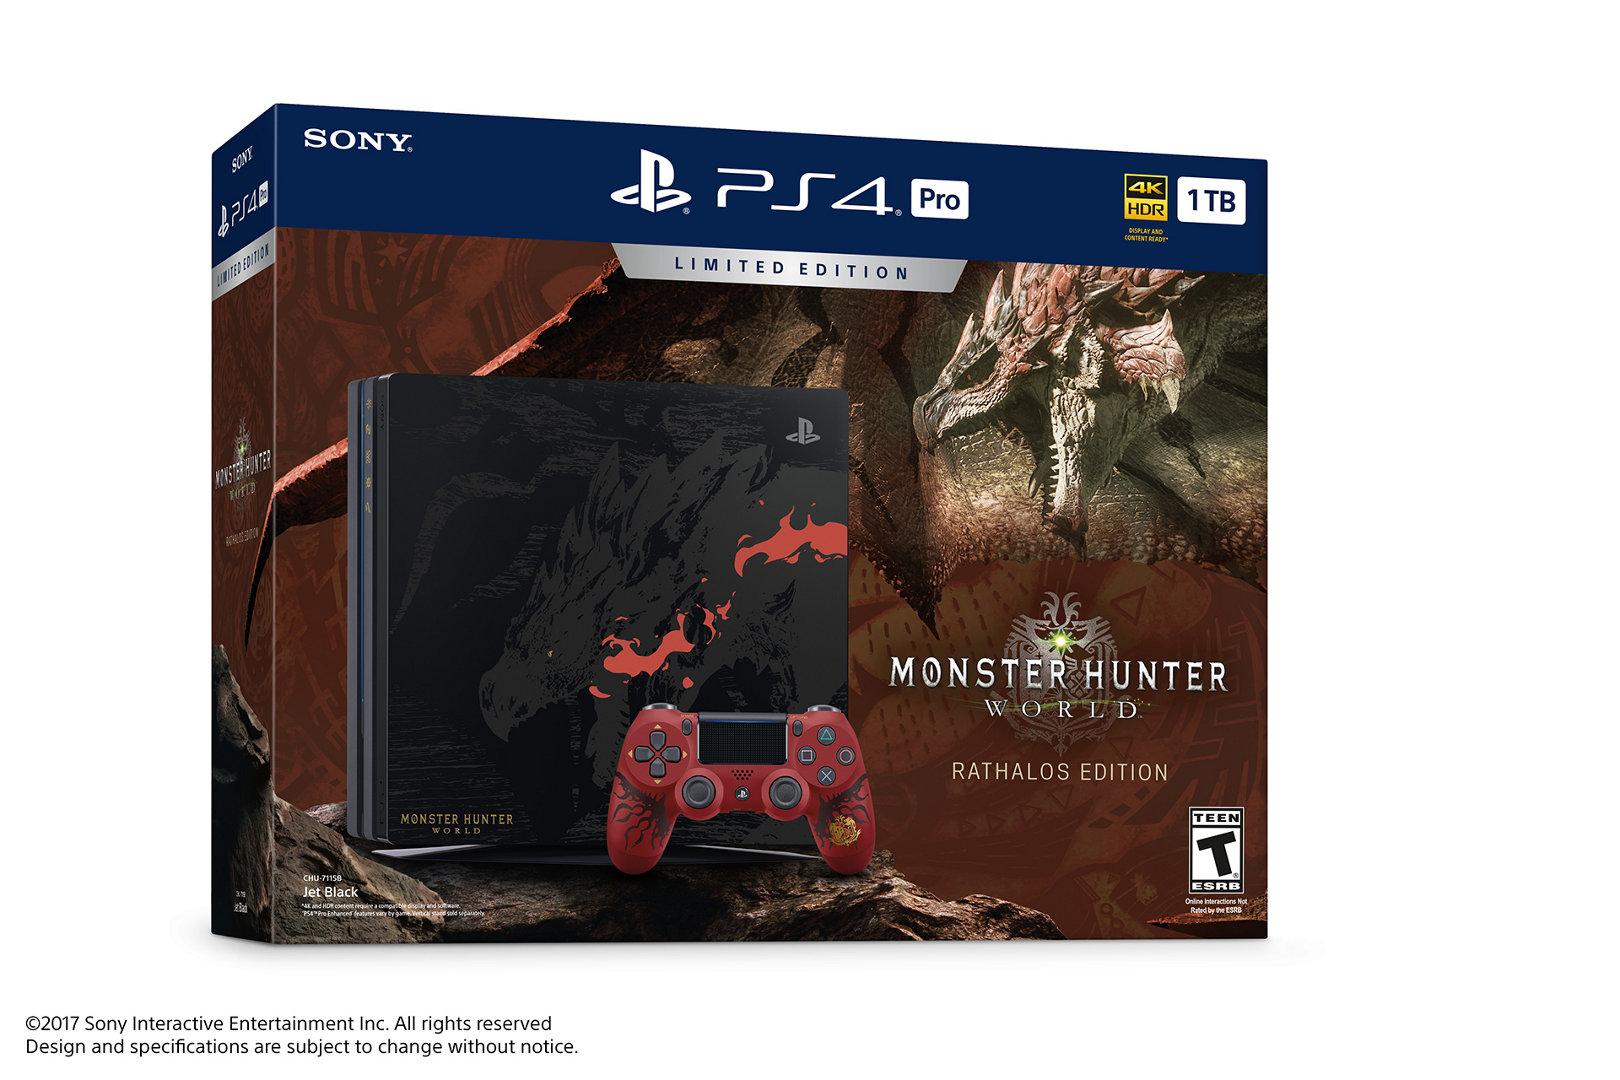 Limited Edition Monster Hunter: World PS4 Pro Bundle